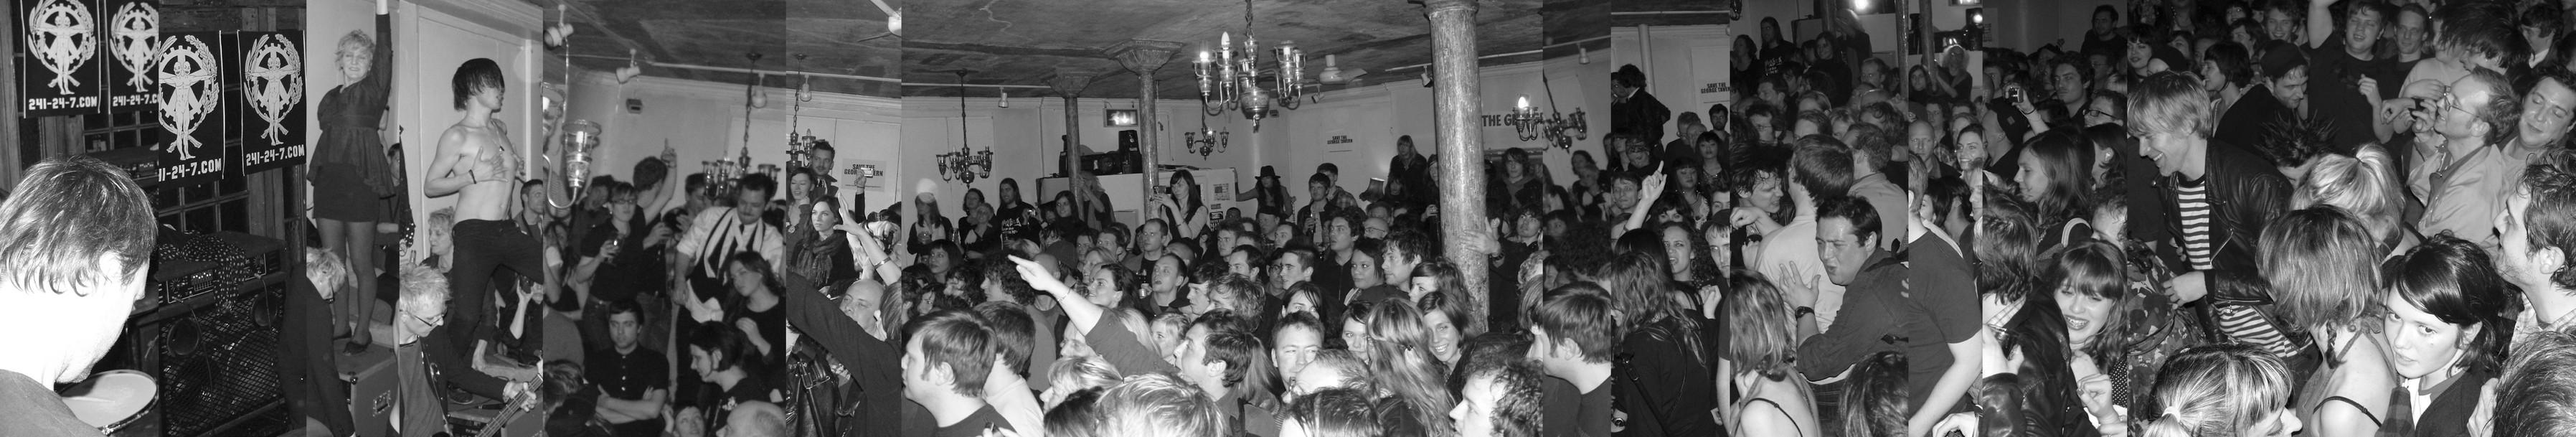 29/02/08 LIVE EVENT